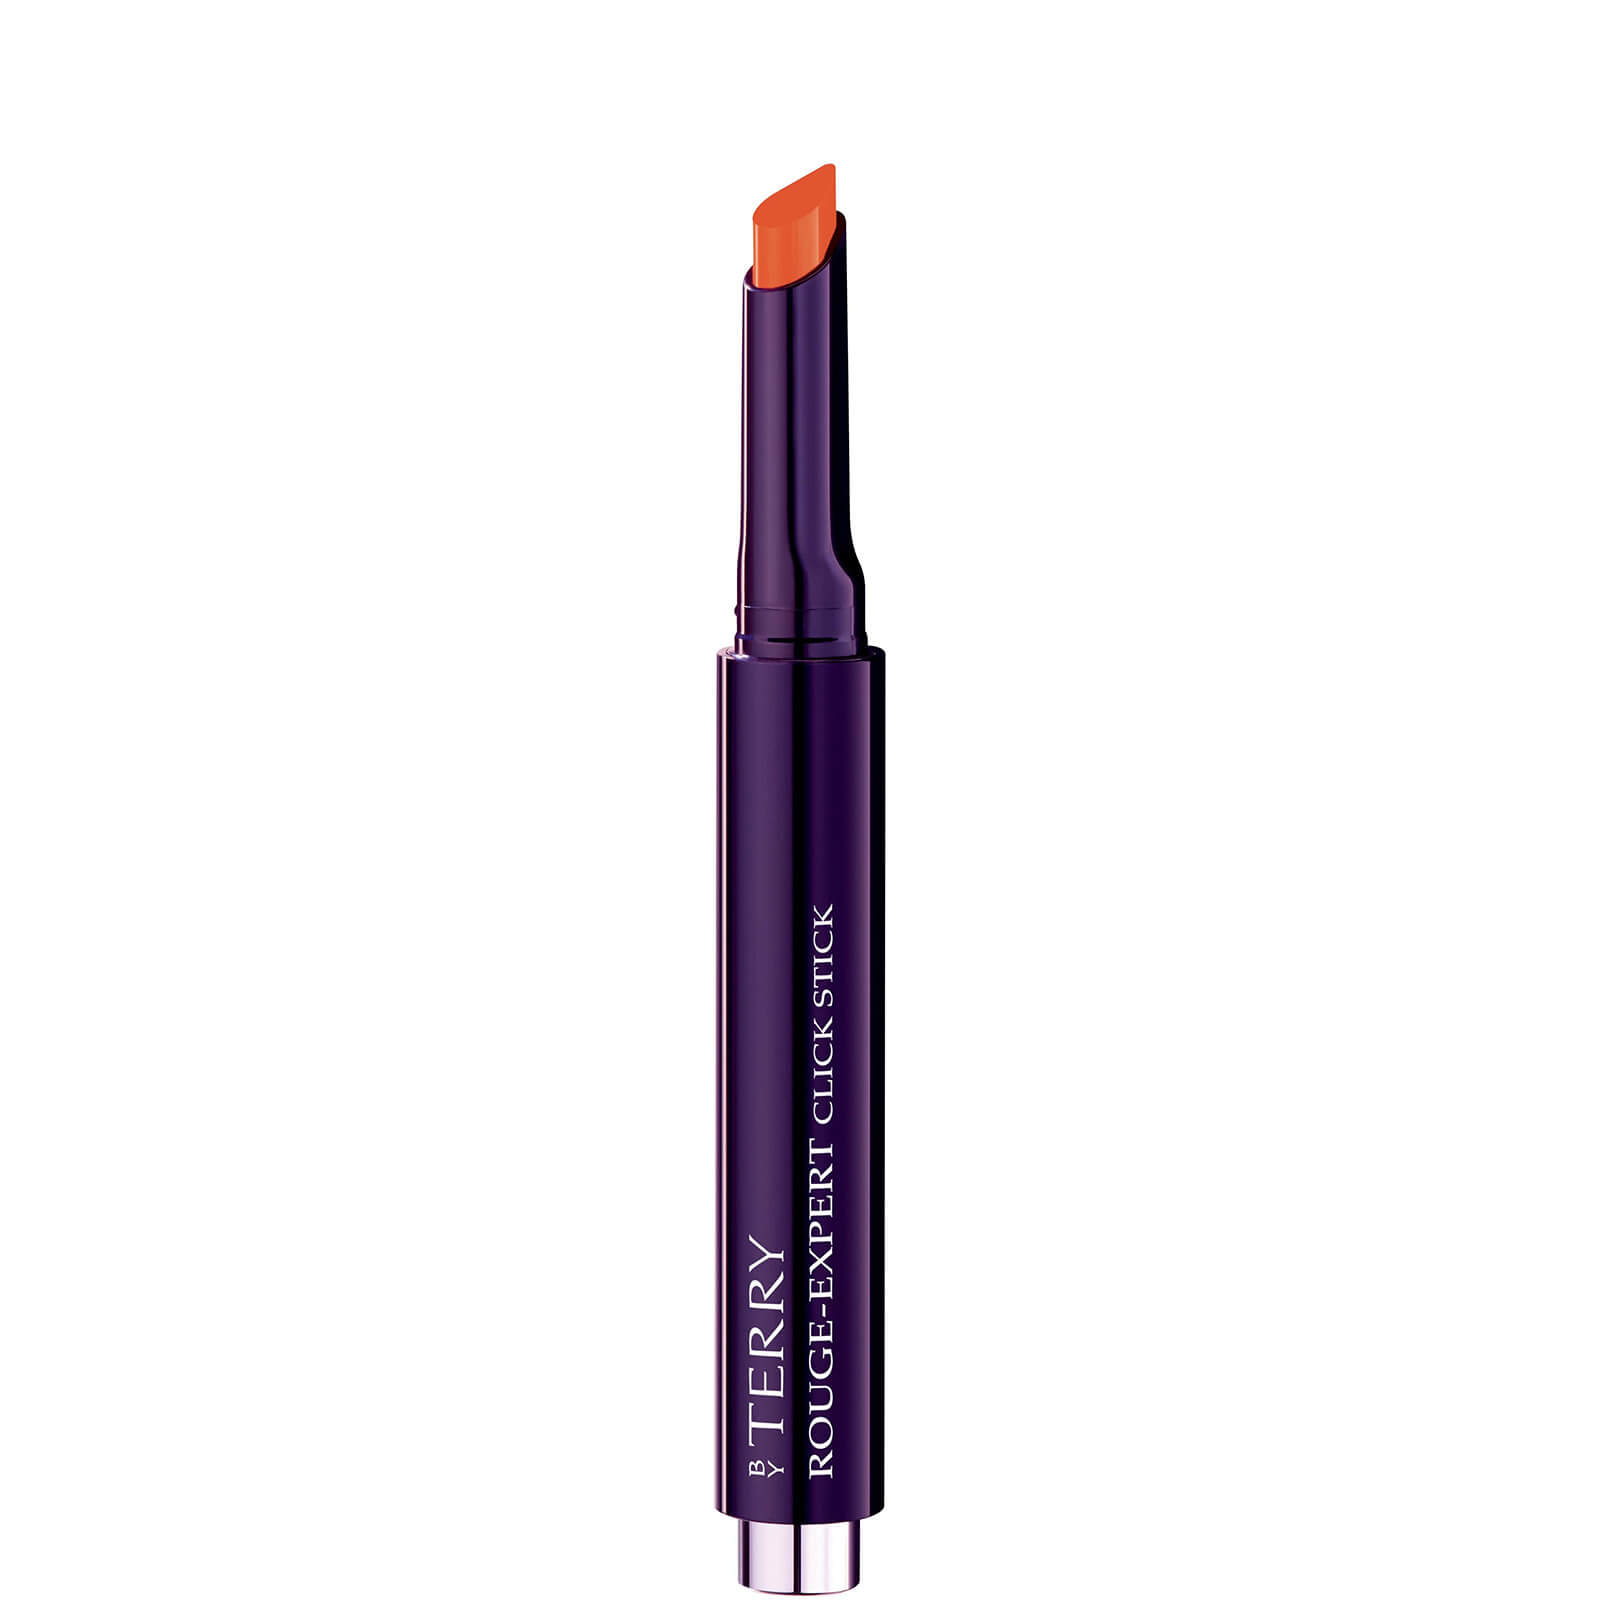 Купить Губная помада By Terry Rouge-Expert Click Stick Lipstick 1, 5 г (различные оттенки) - Chilly Cream